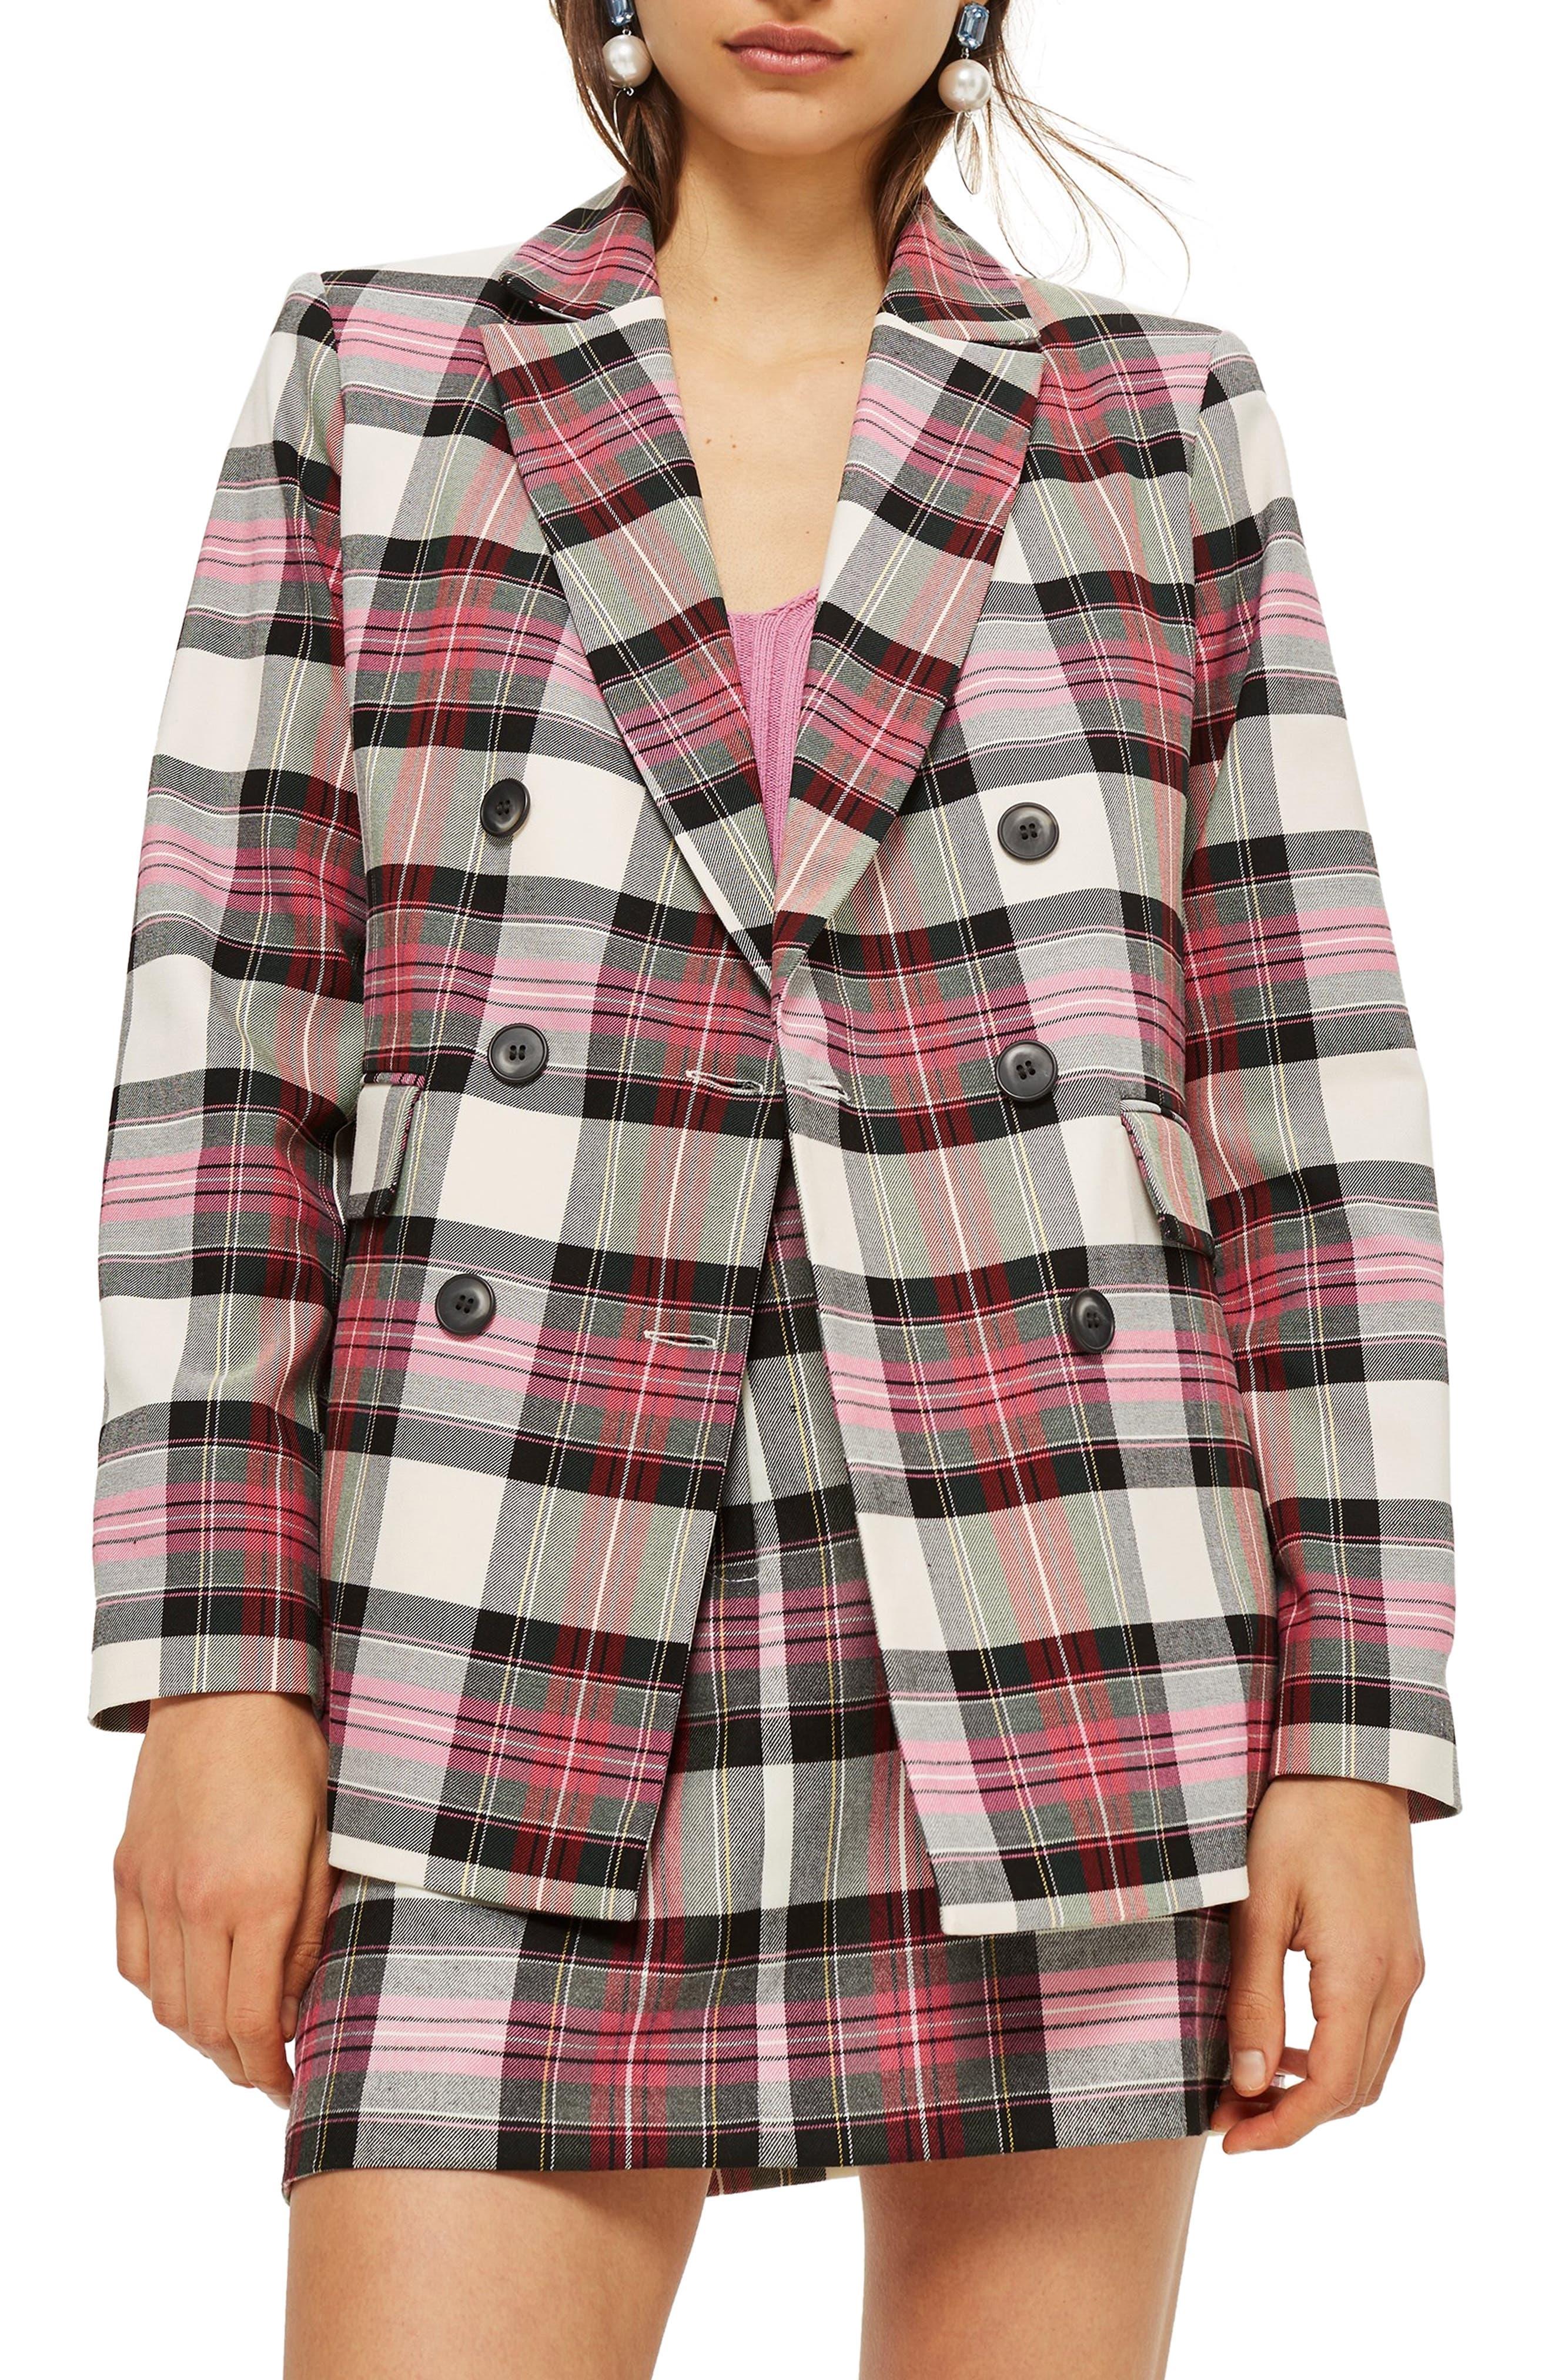 TOPSHOP, Tartan Double Breasted Jacket, Main thumbnail 1, color, 650